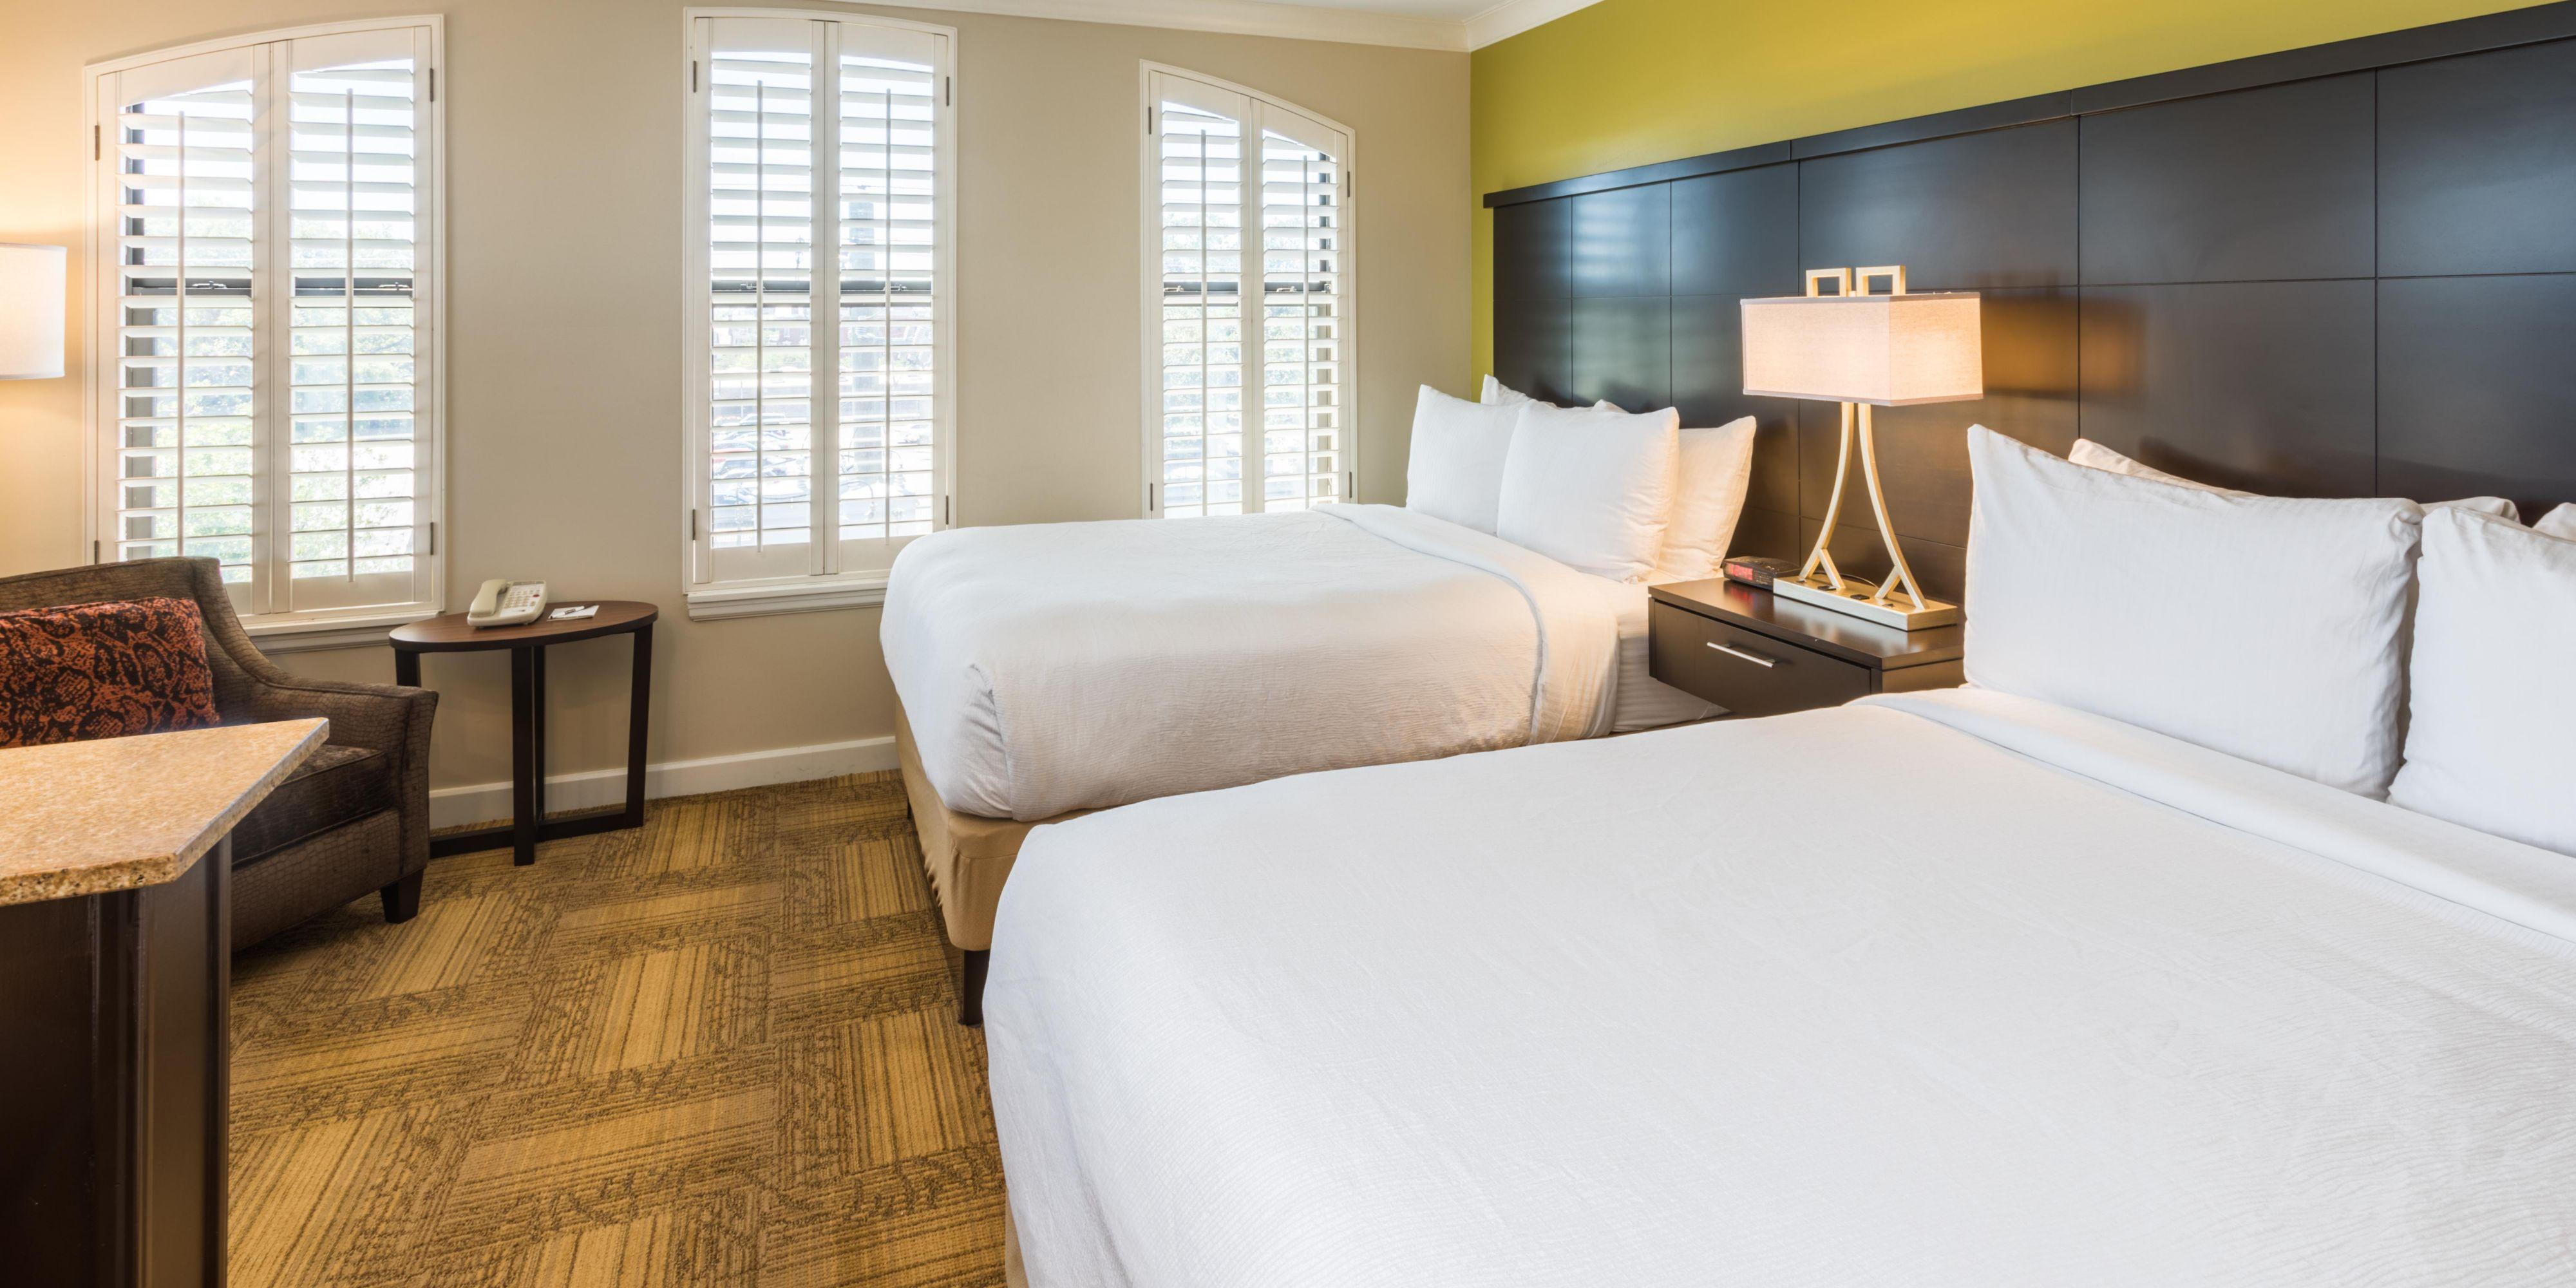 Staybridge Suites Savannah Historic District Hotel by IHG